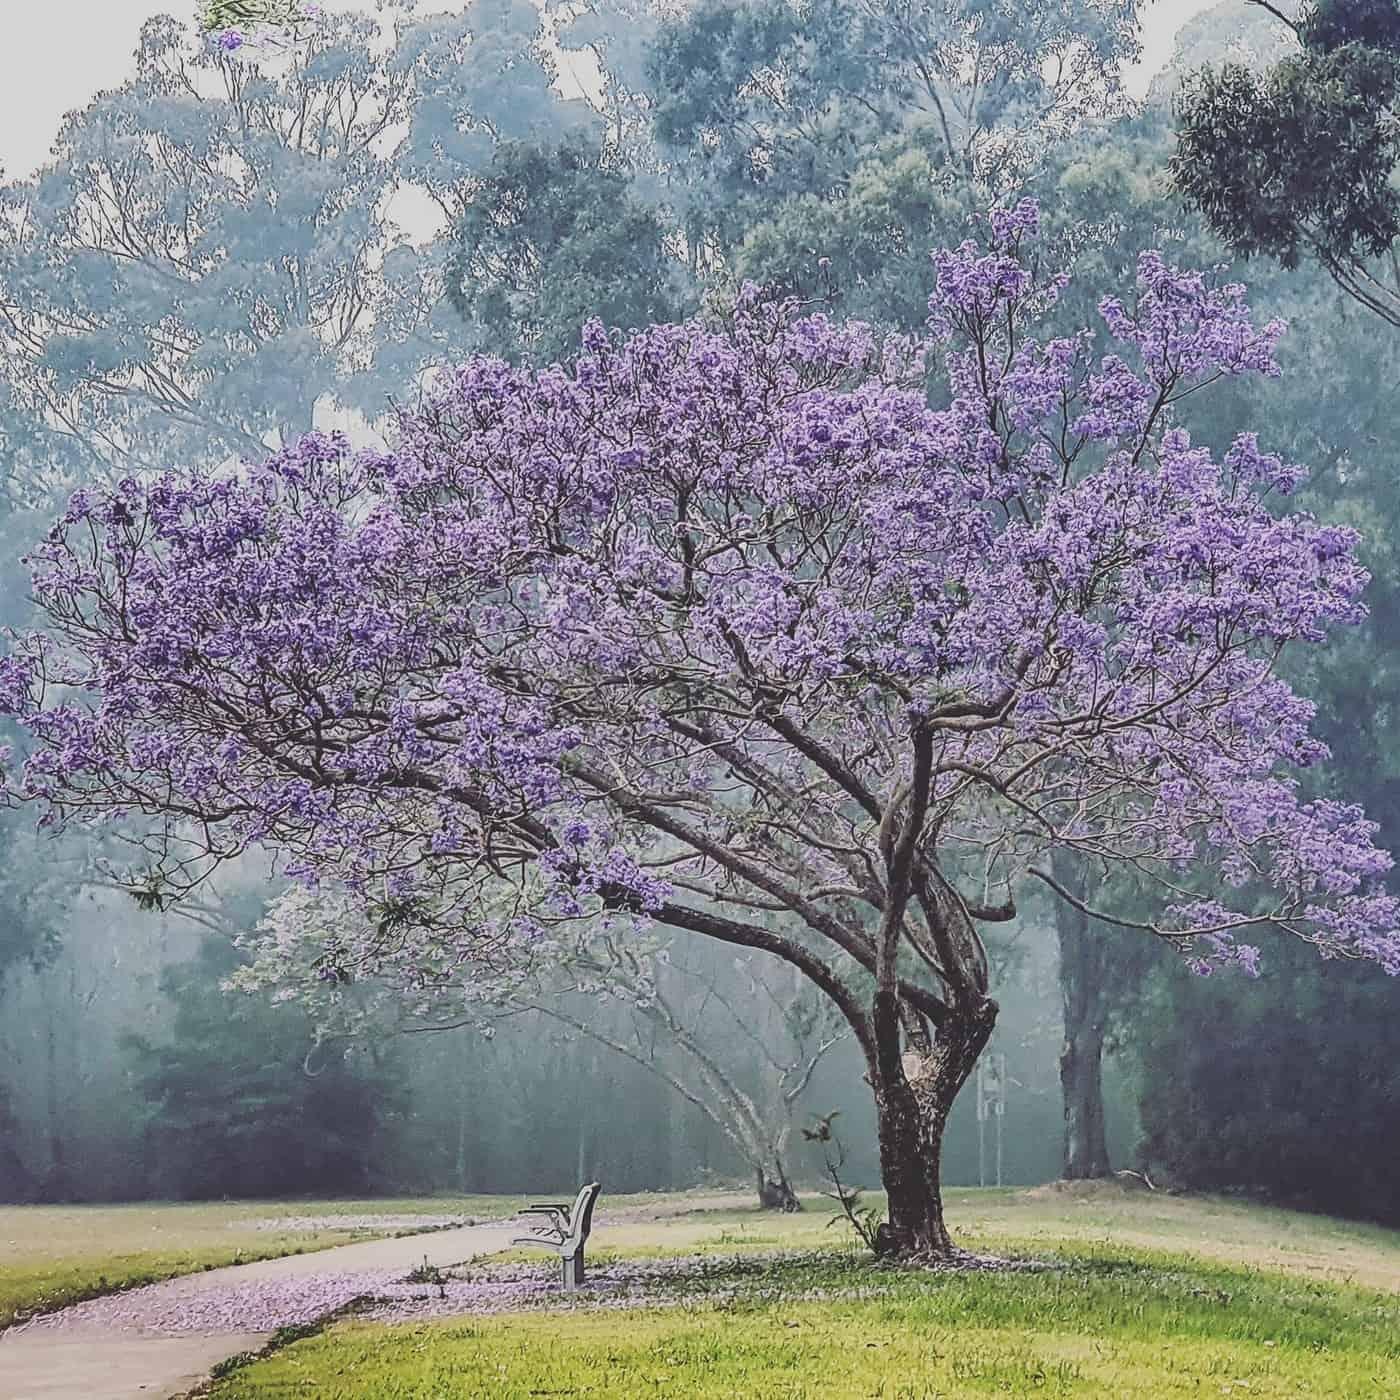 Eerie Peaceful Beauty